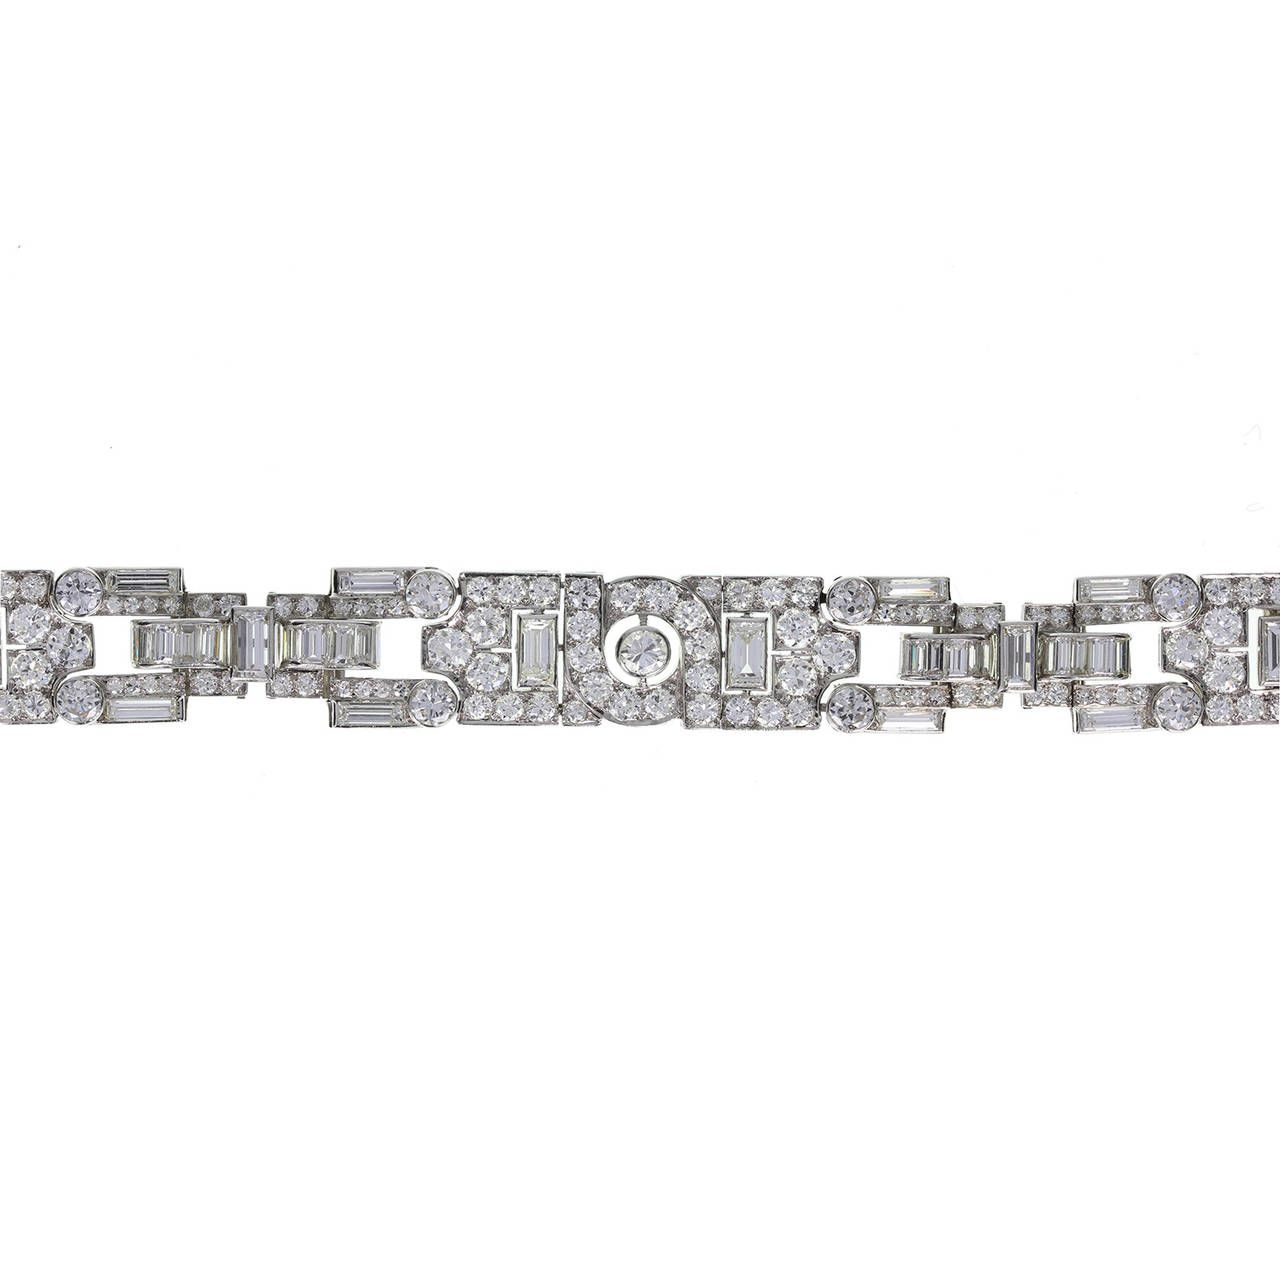 Garrard Art Deco Diamond Platinum Panel Bracelet | From a unique collection of vintage link bracelets at https://www.1stdibs.com/jewelry/bracelets/link-bracelets/